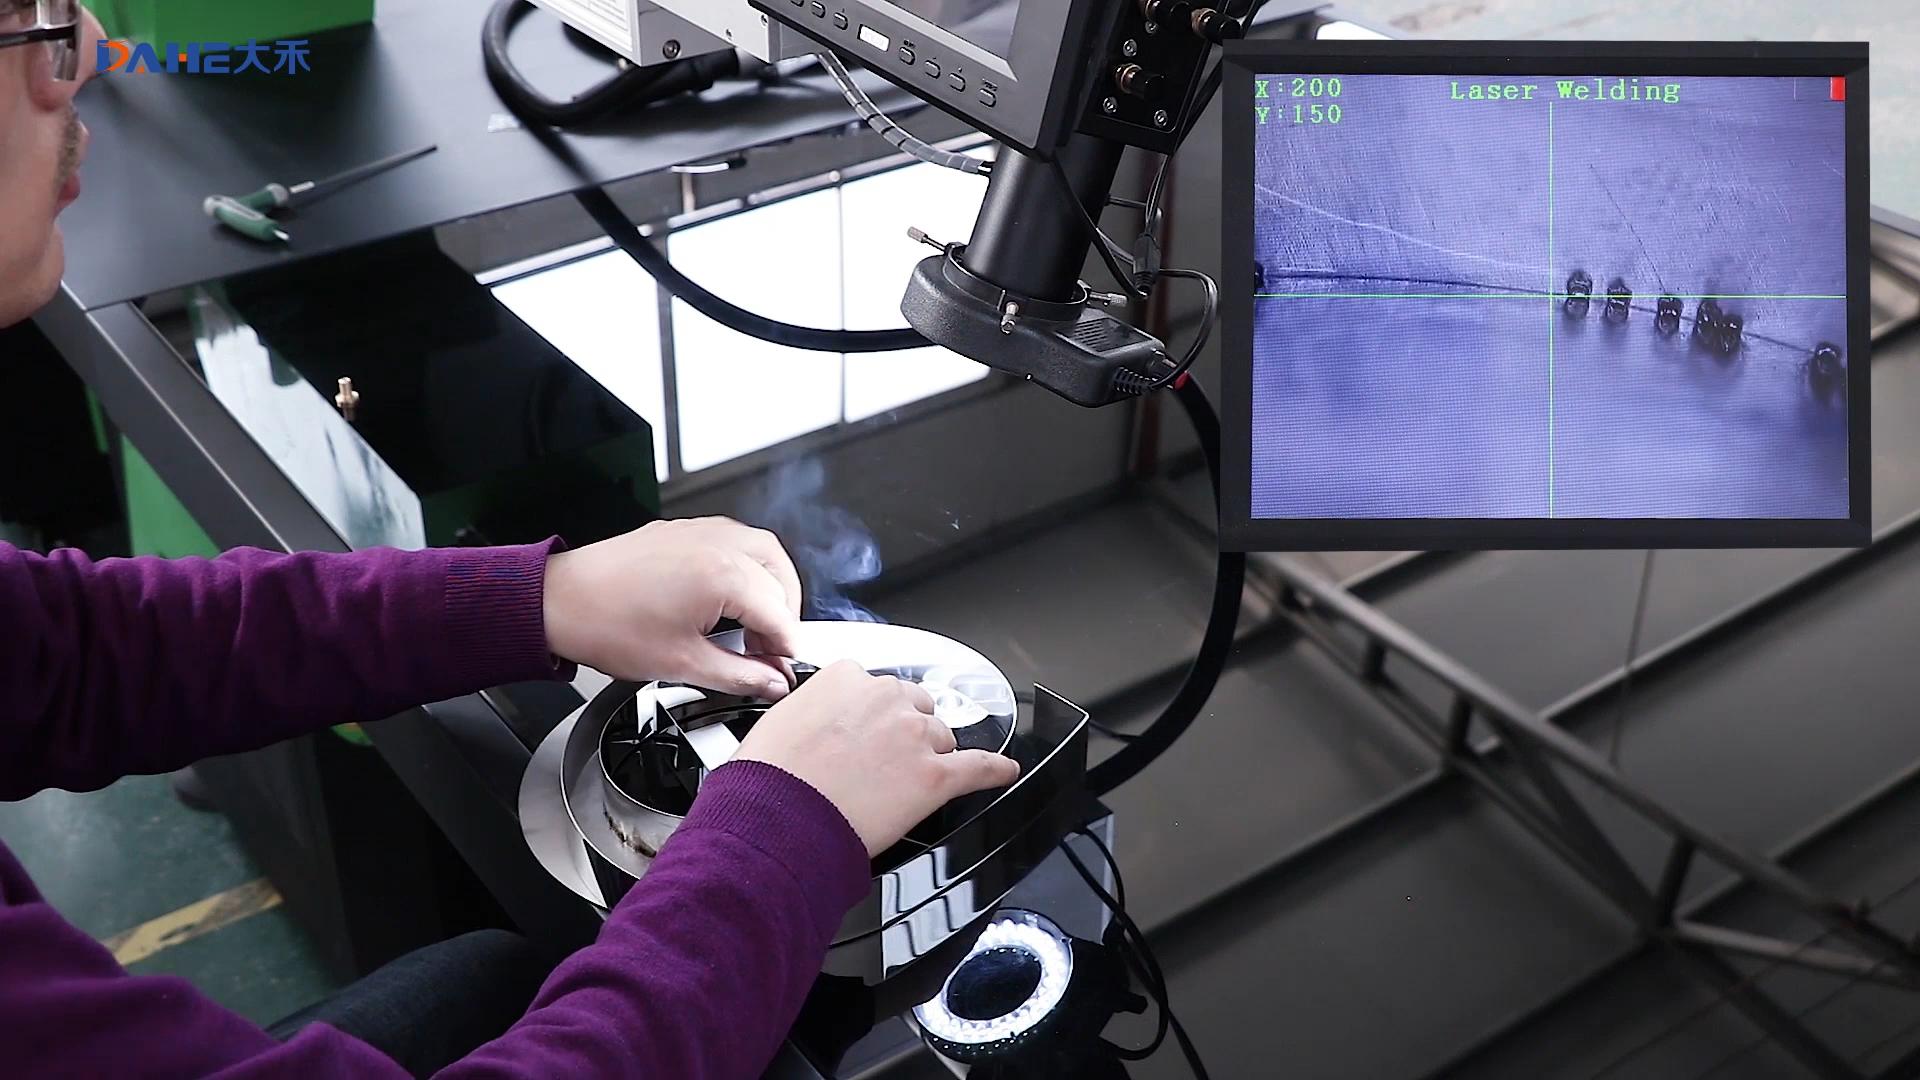 YAG Laser di Saldatura Macchina/Laser di saldatura mani per la Lettera del canale